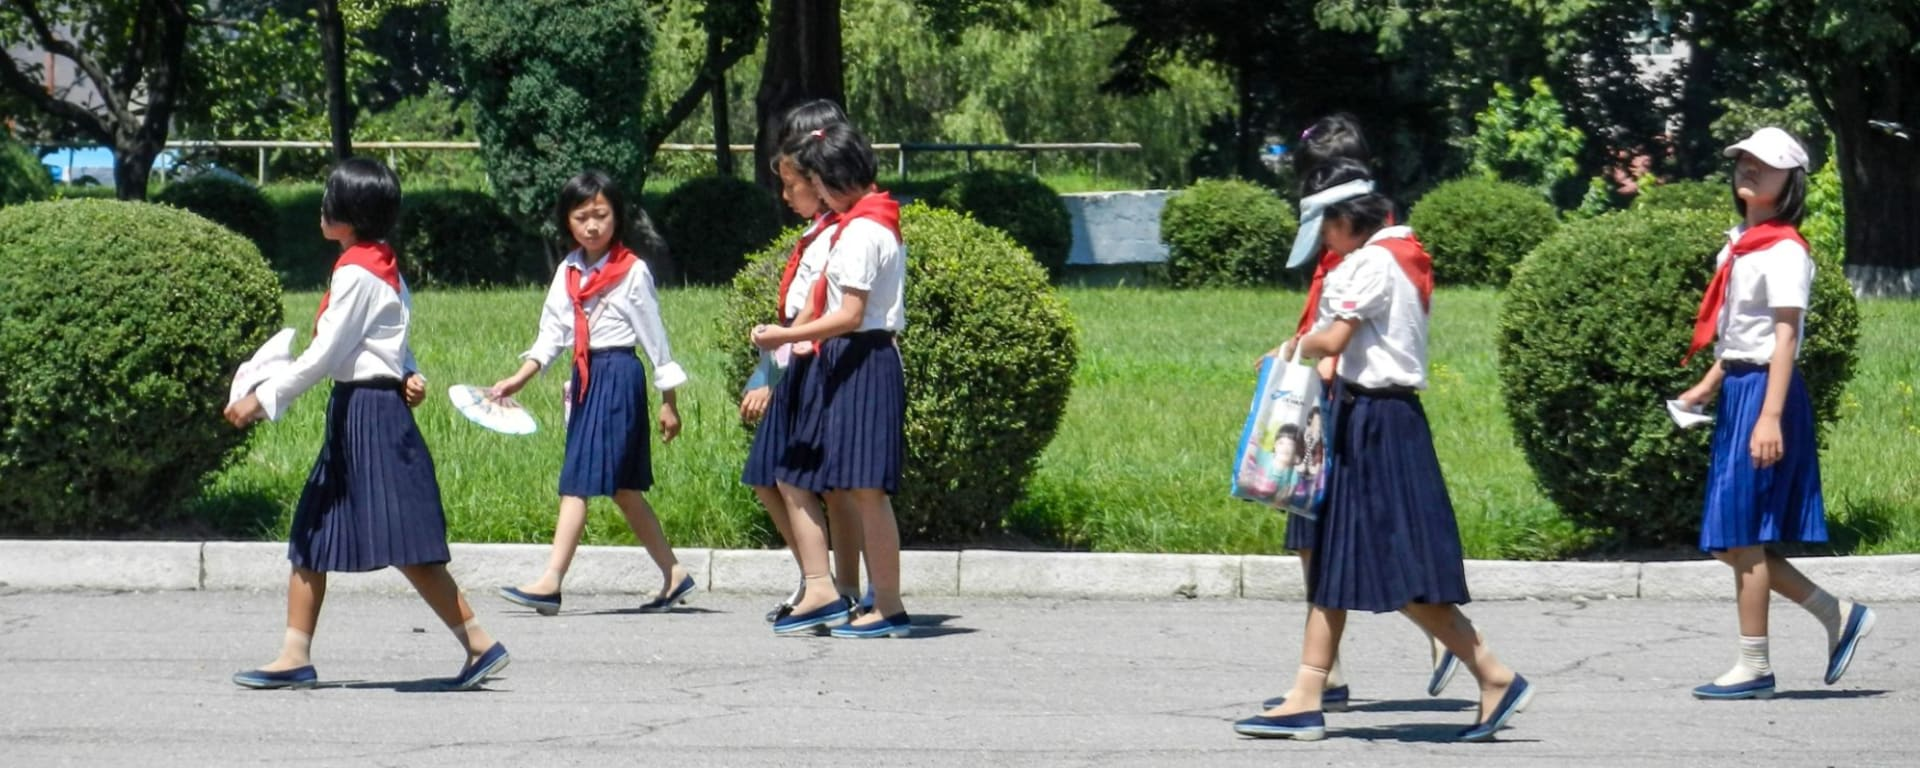 Nordkorea Kompakt ab Pyongyang: Pyongyang School Kids